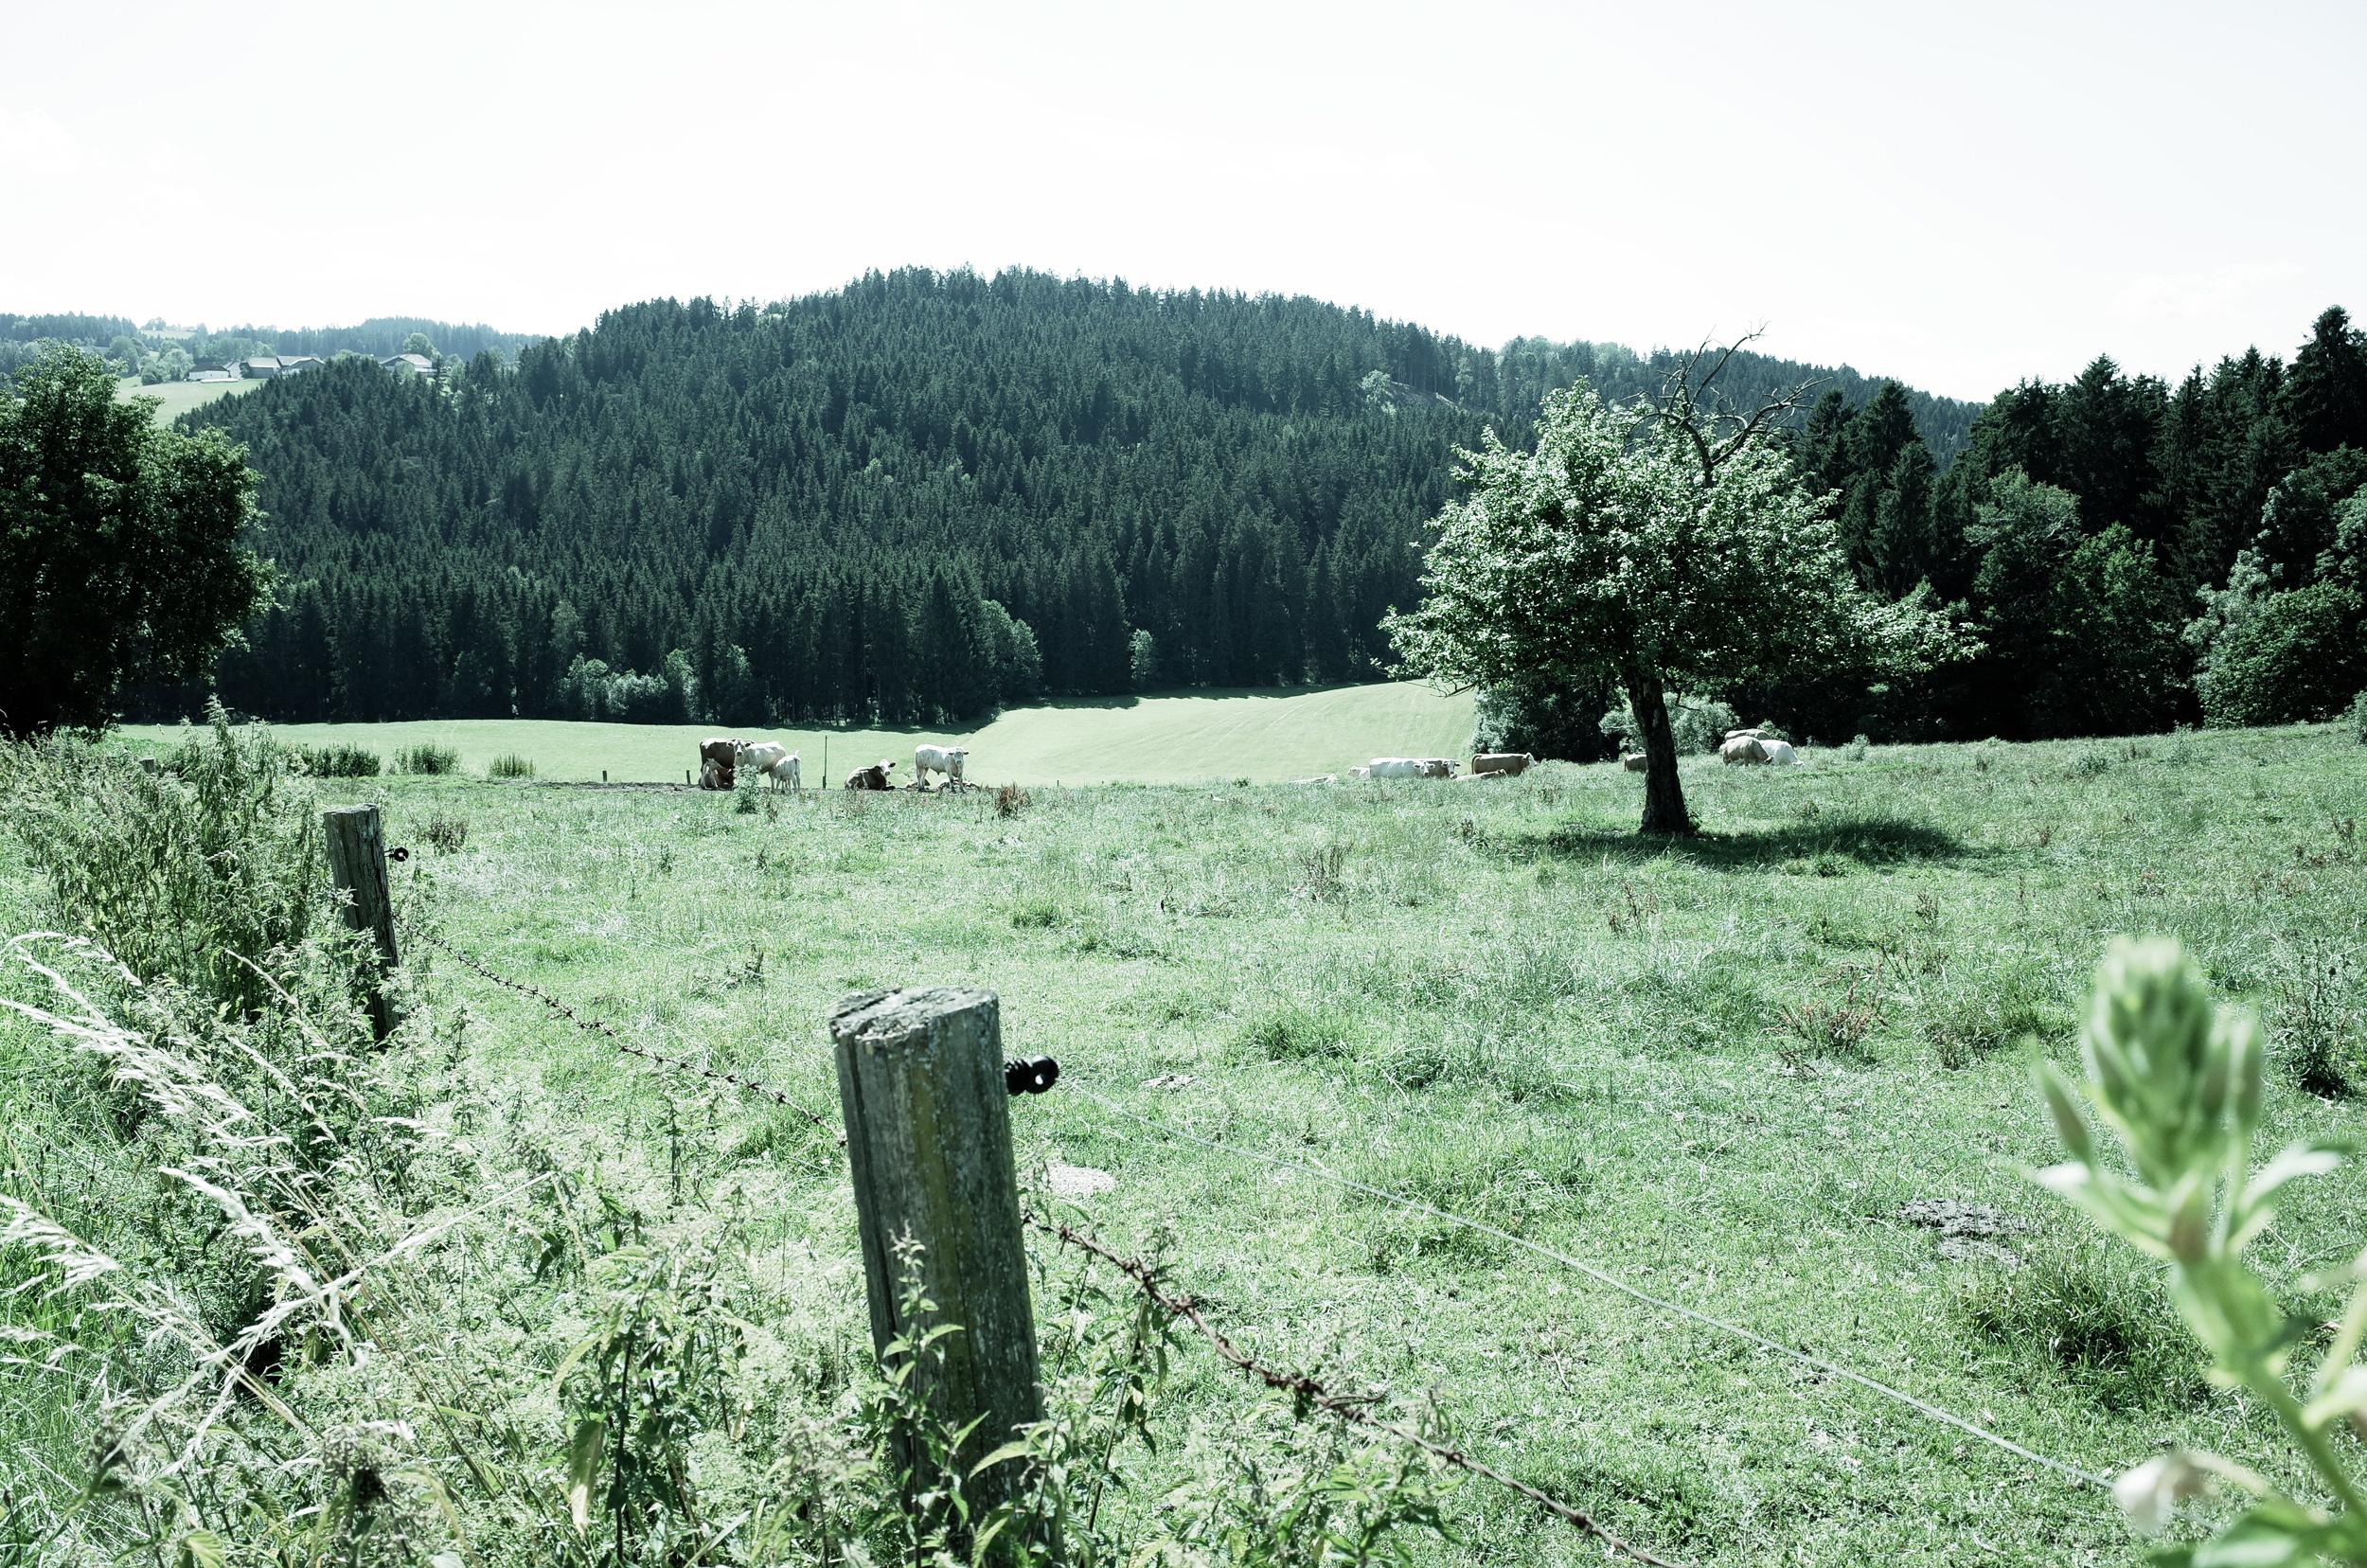 Granitpilgern Am Weg